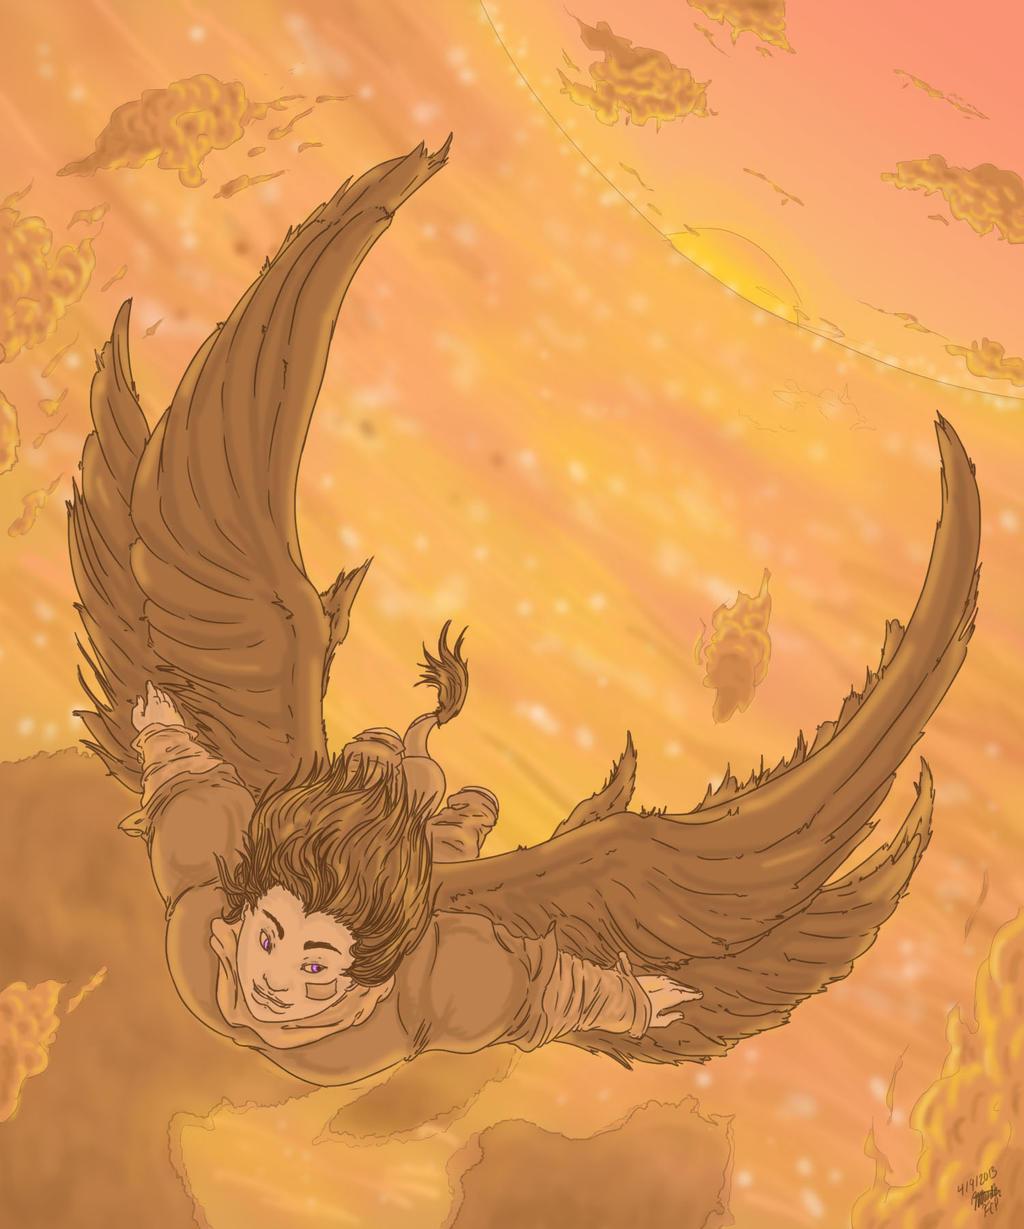 HPM Flying High by FieldCommanderPrinny